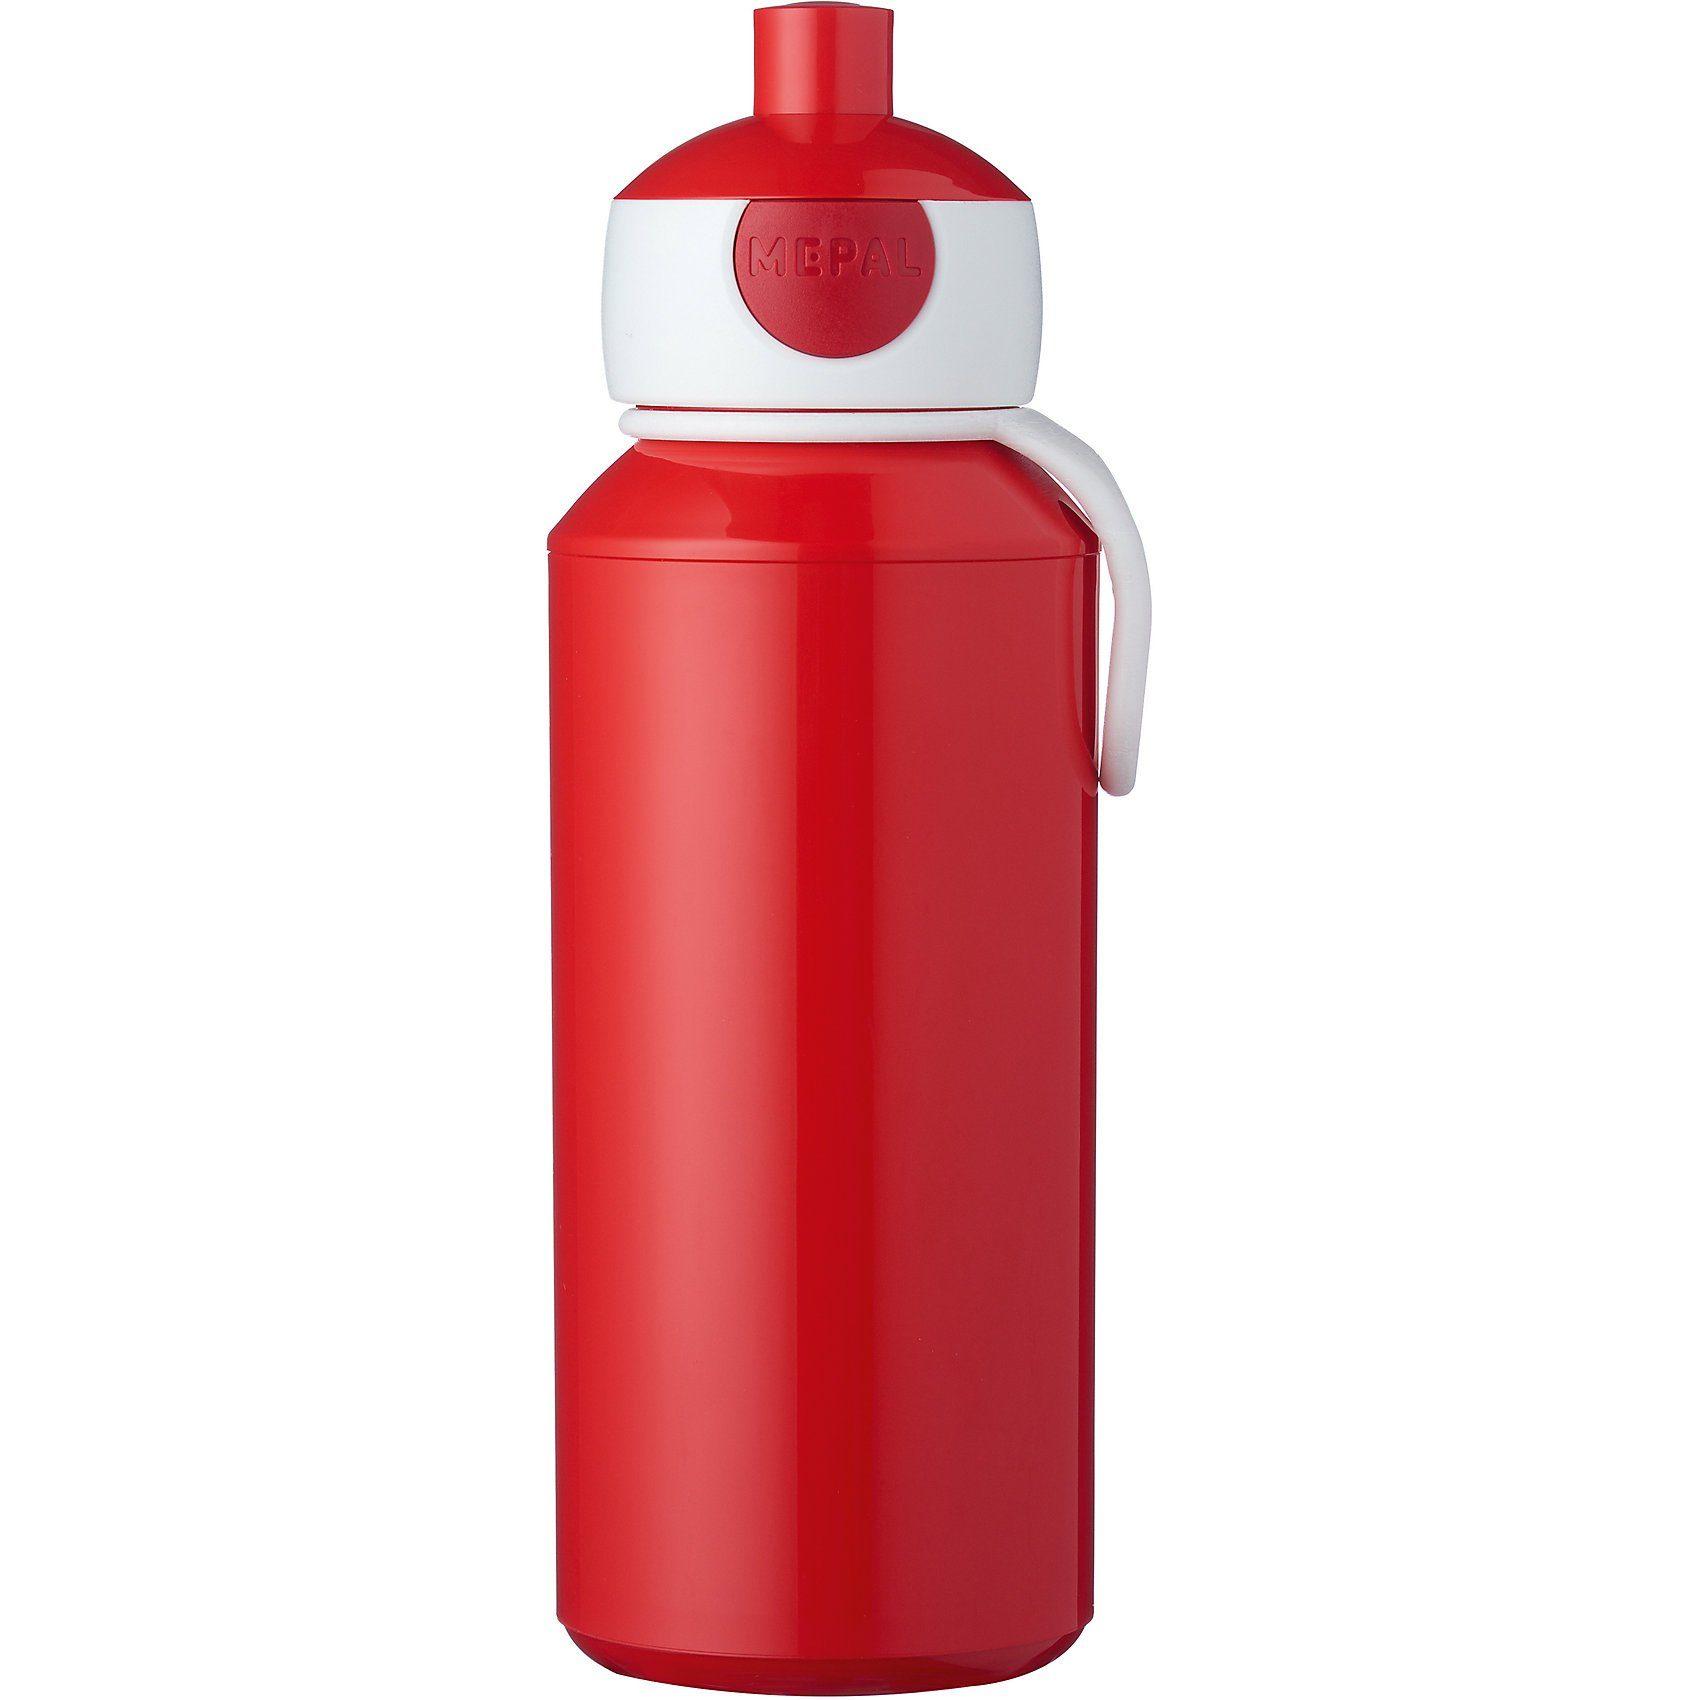 Rosti Mepal Trinkflasche pop-up campus rot, 400 ml